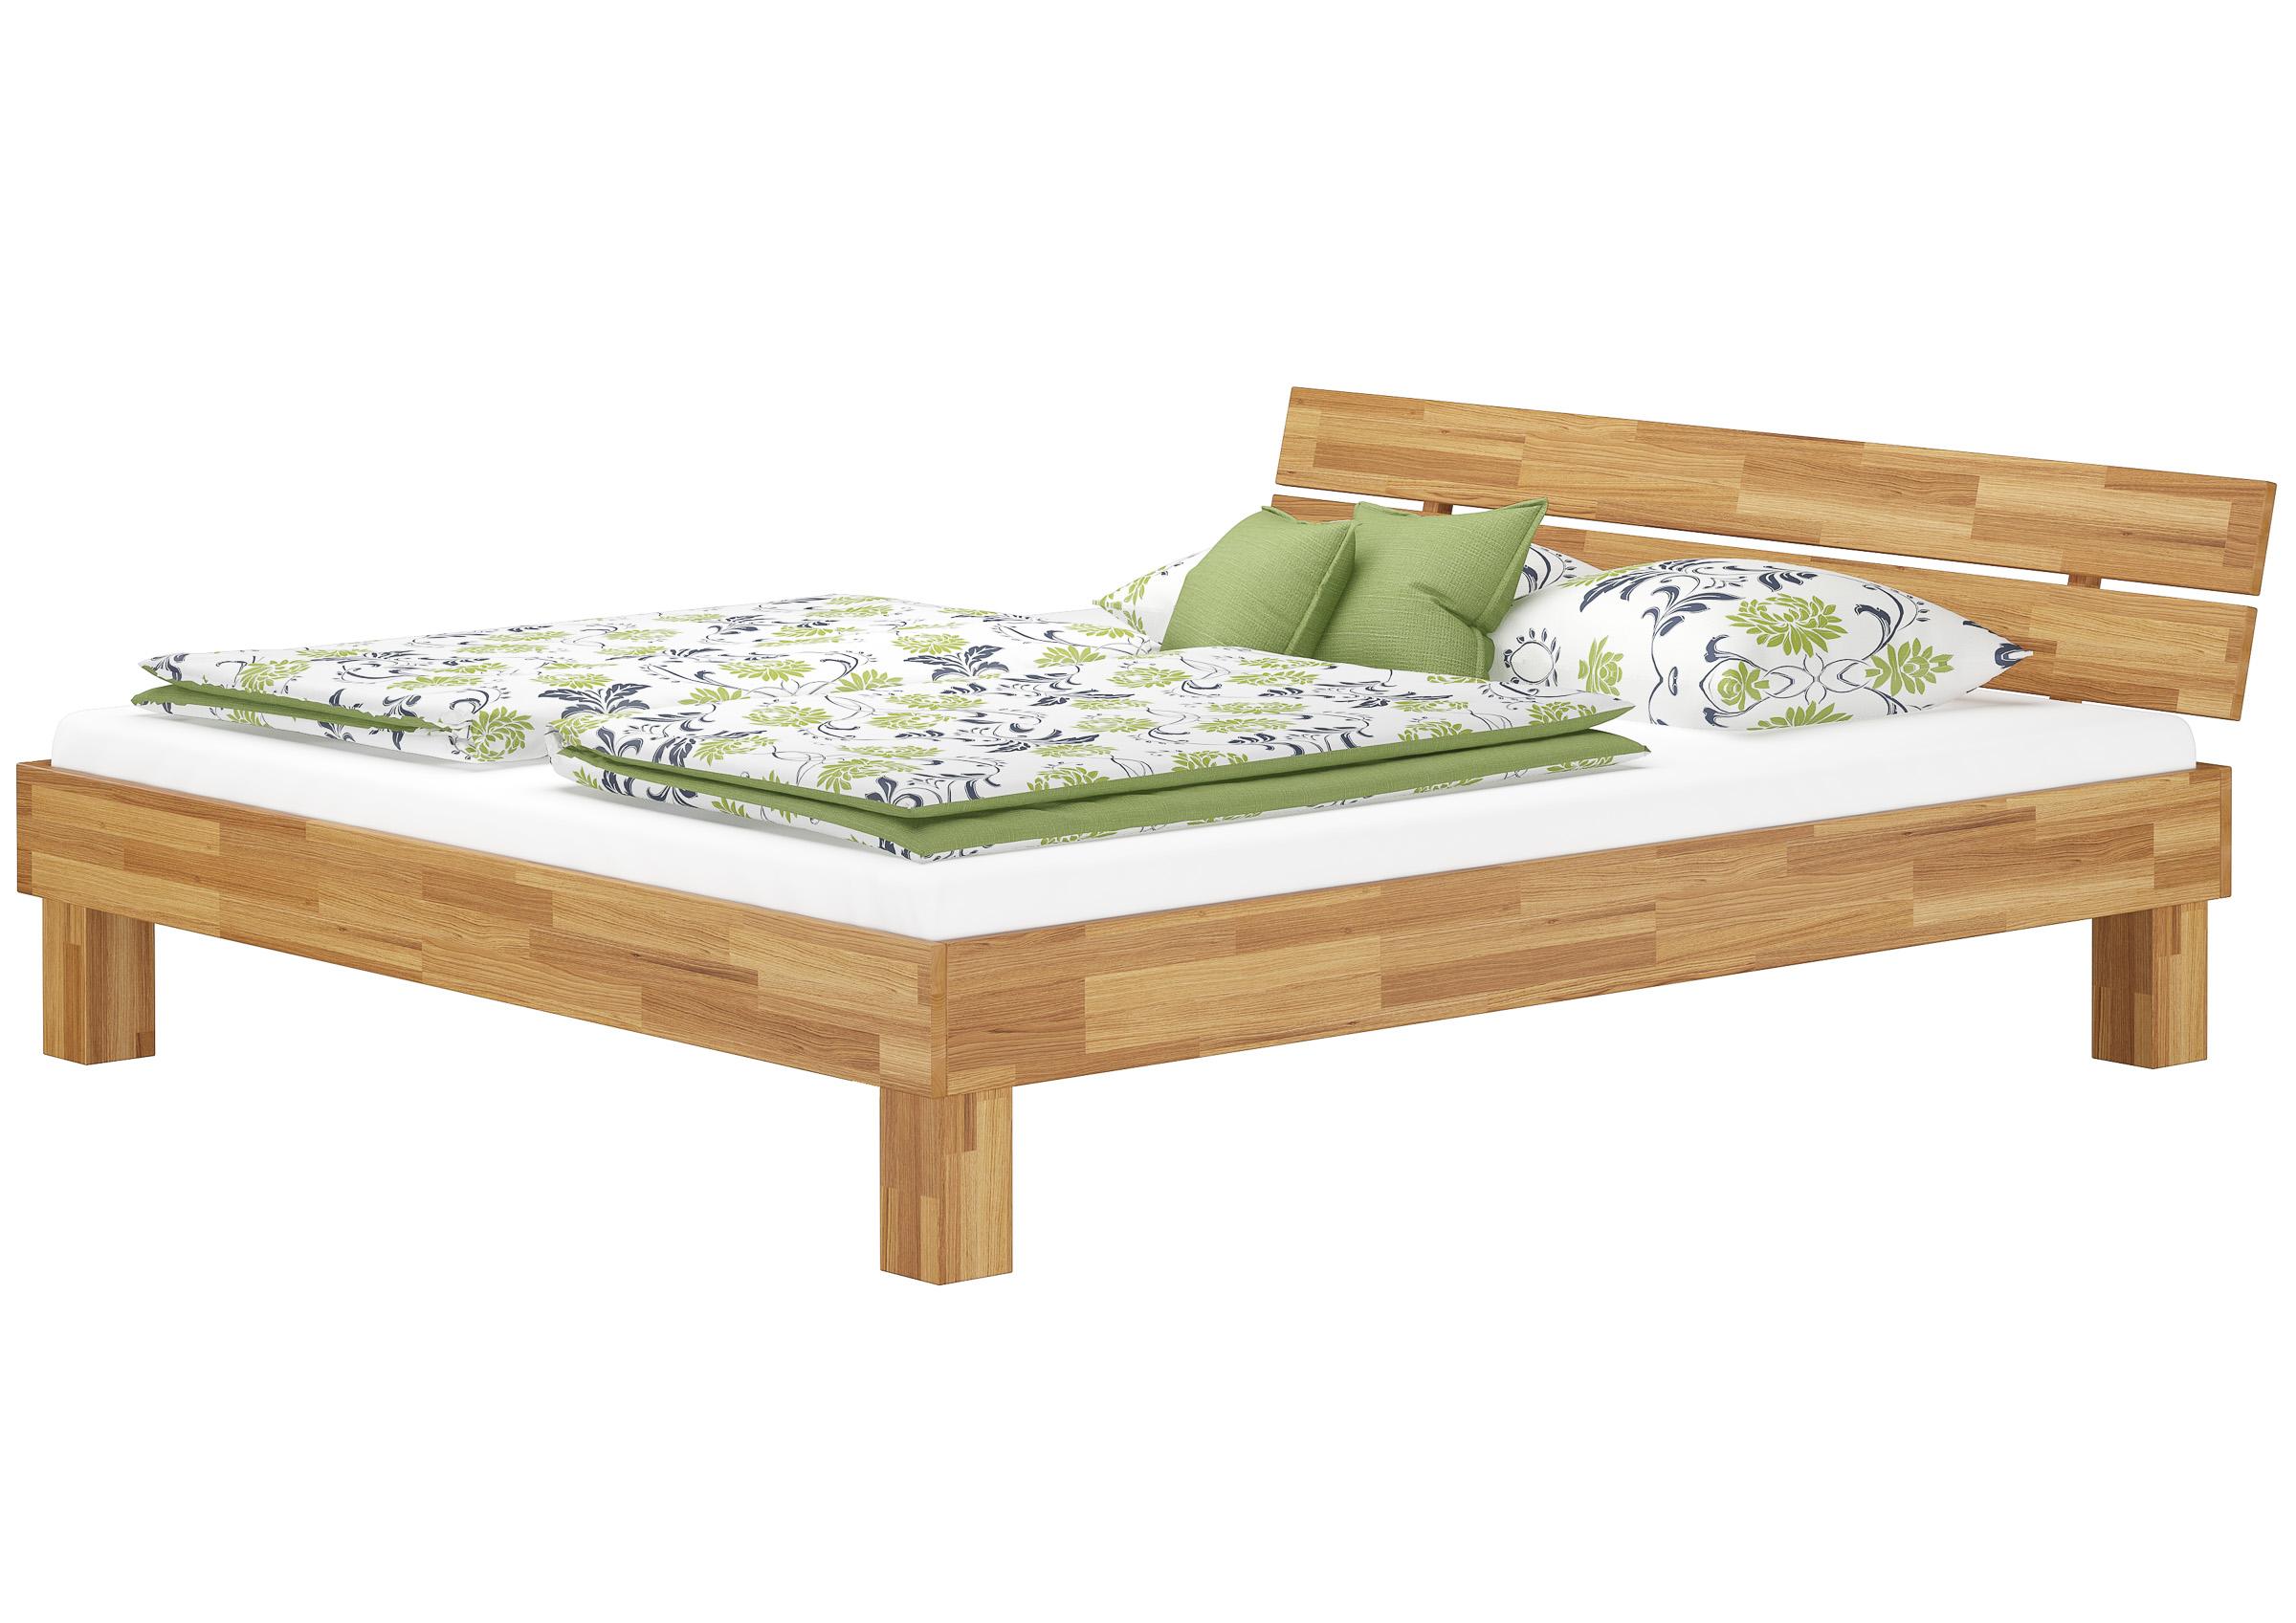 Full Size of Komplettbett 180x220 Eiche Massivholz Doppelbett 180x200 Mit Durchgehender Matratze Bett Wohnzimmer Komplettbett 180x220